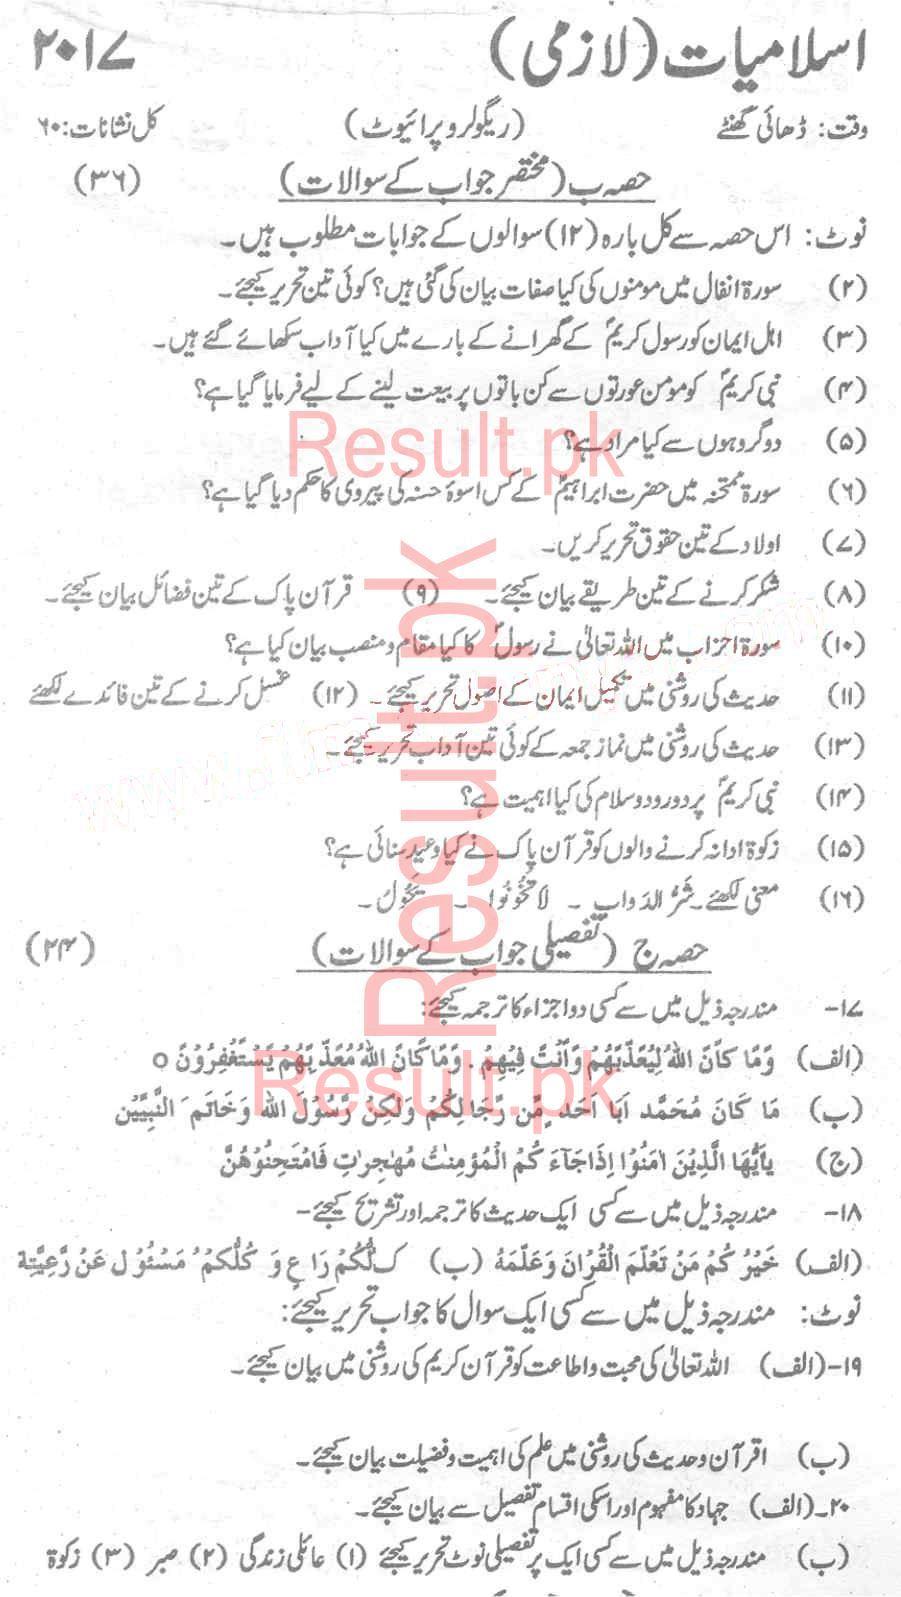 BSEK Karachi Board Past Papers 2018 Matric, SSC Part 1 & 2